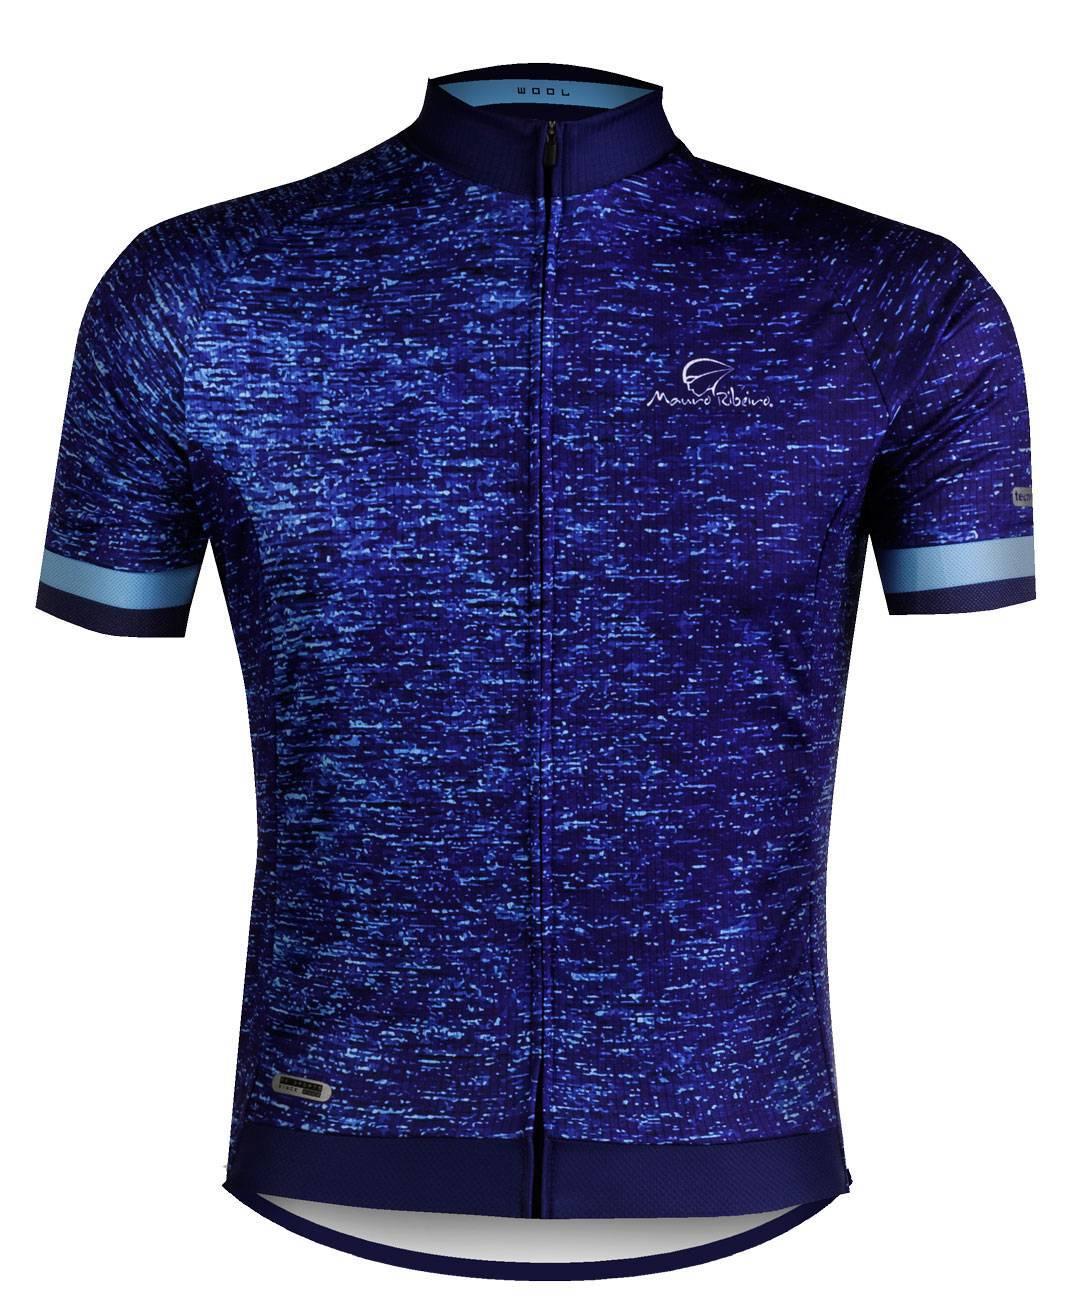 Camisa Mauro Ribeiro Wool 2019 - BIKE ALLA CARTE